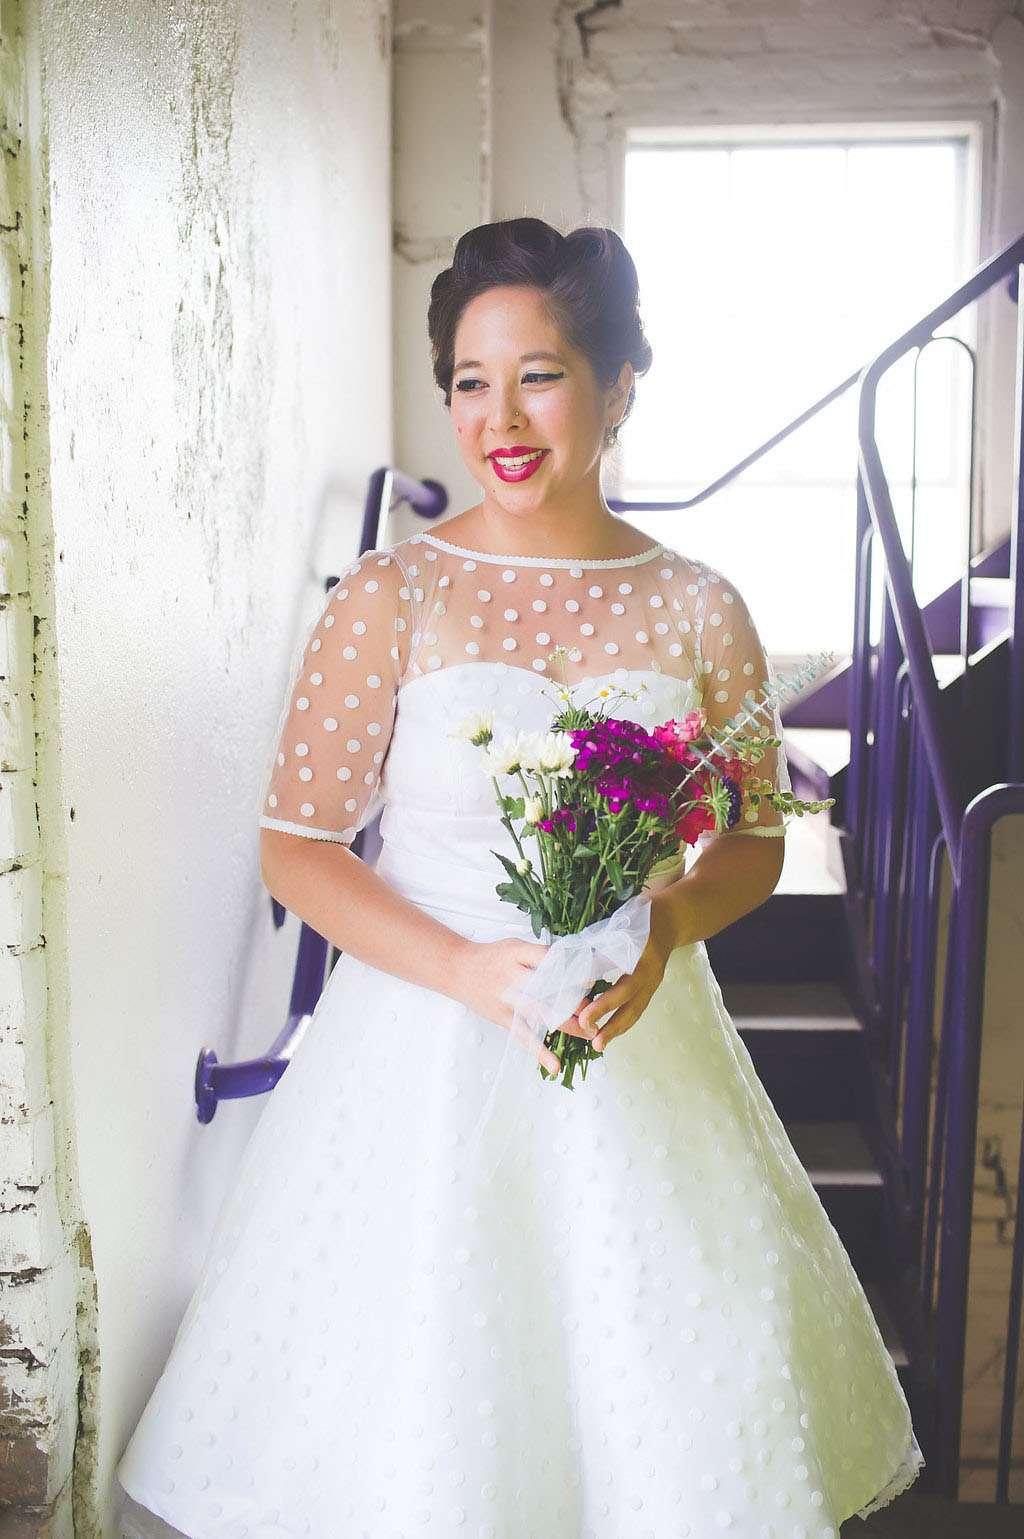 Ann Arbor Wedding Dress 78 Good Retro Inspired Art Gallery